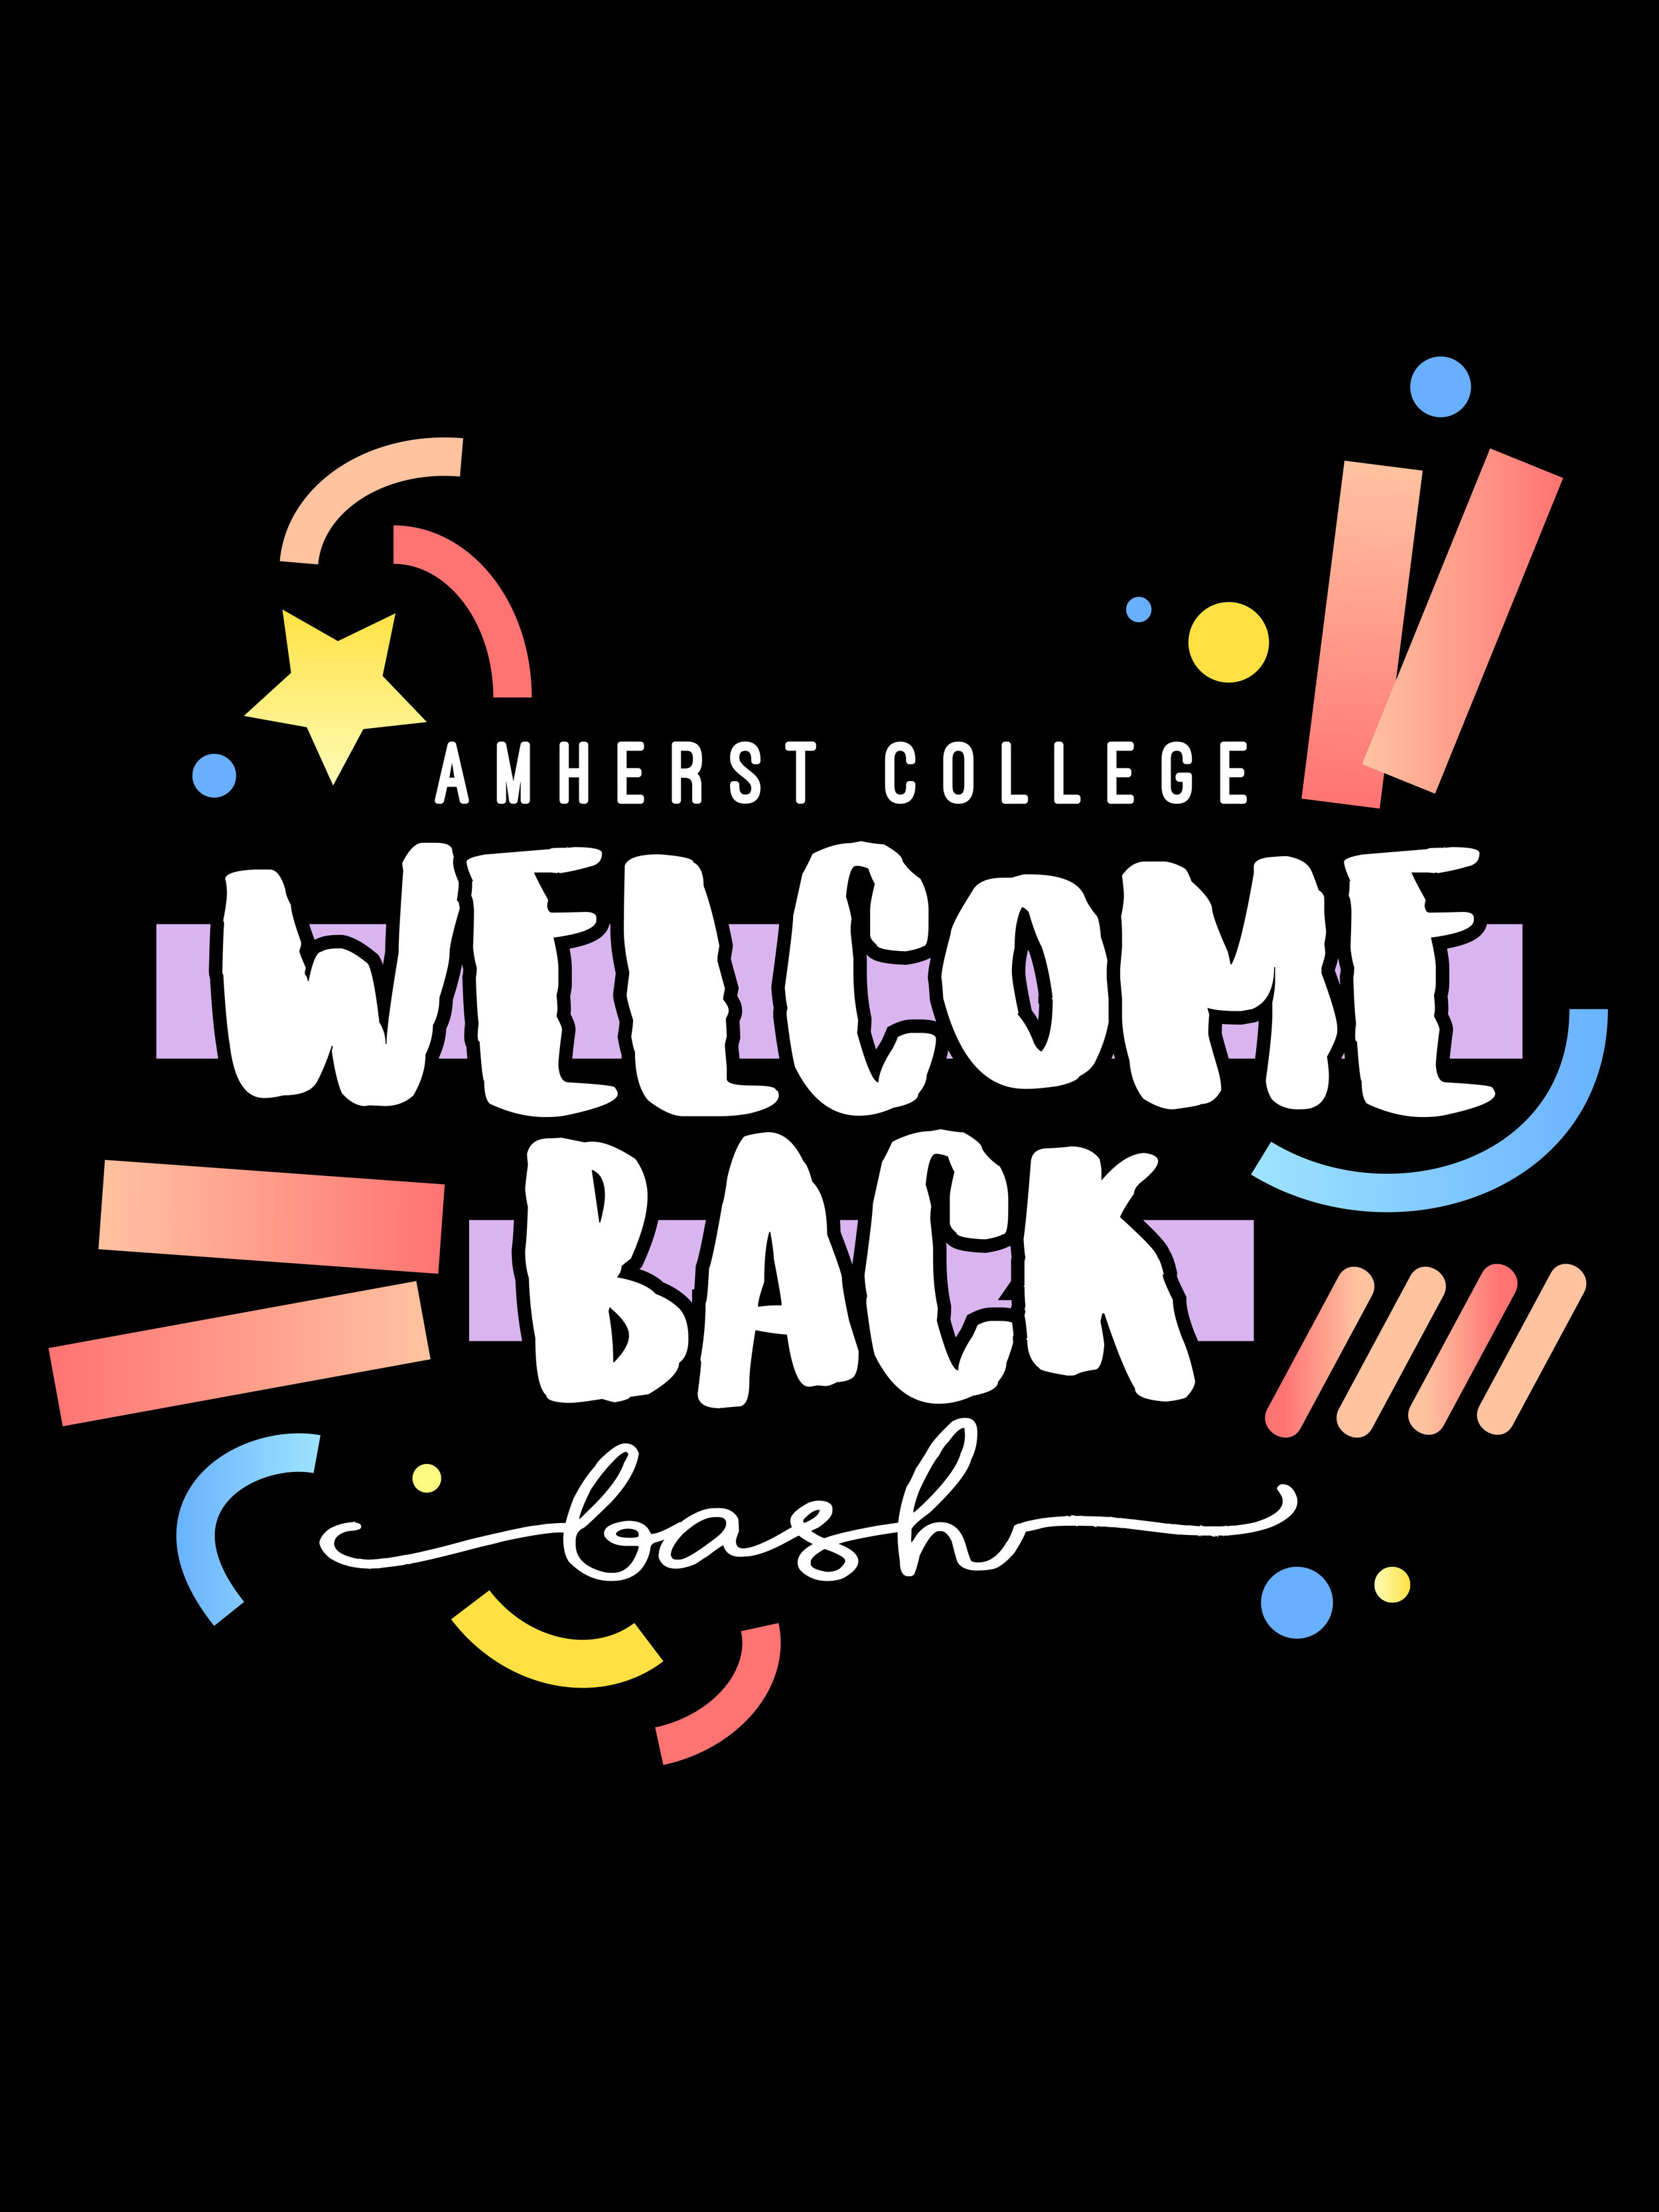 welcomebackbashblack.jpg